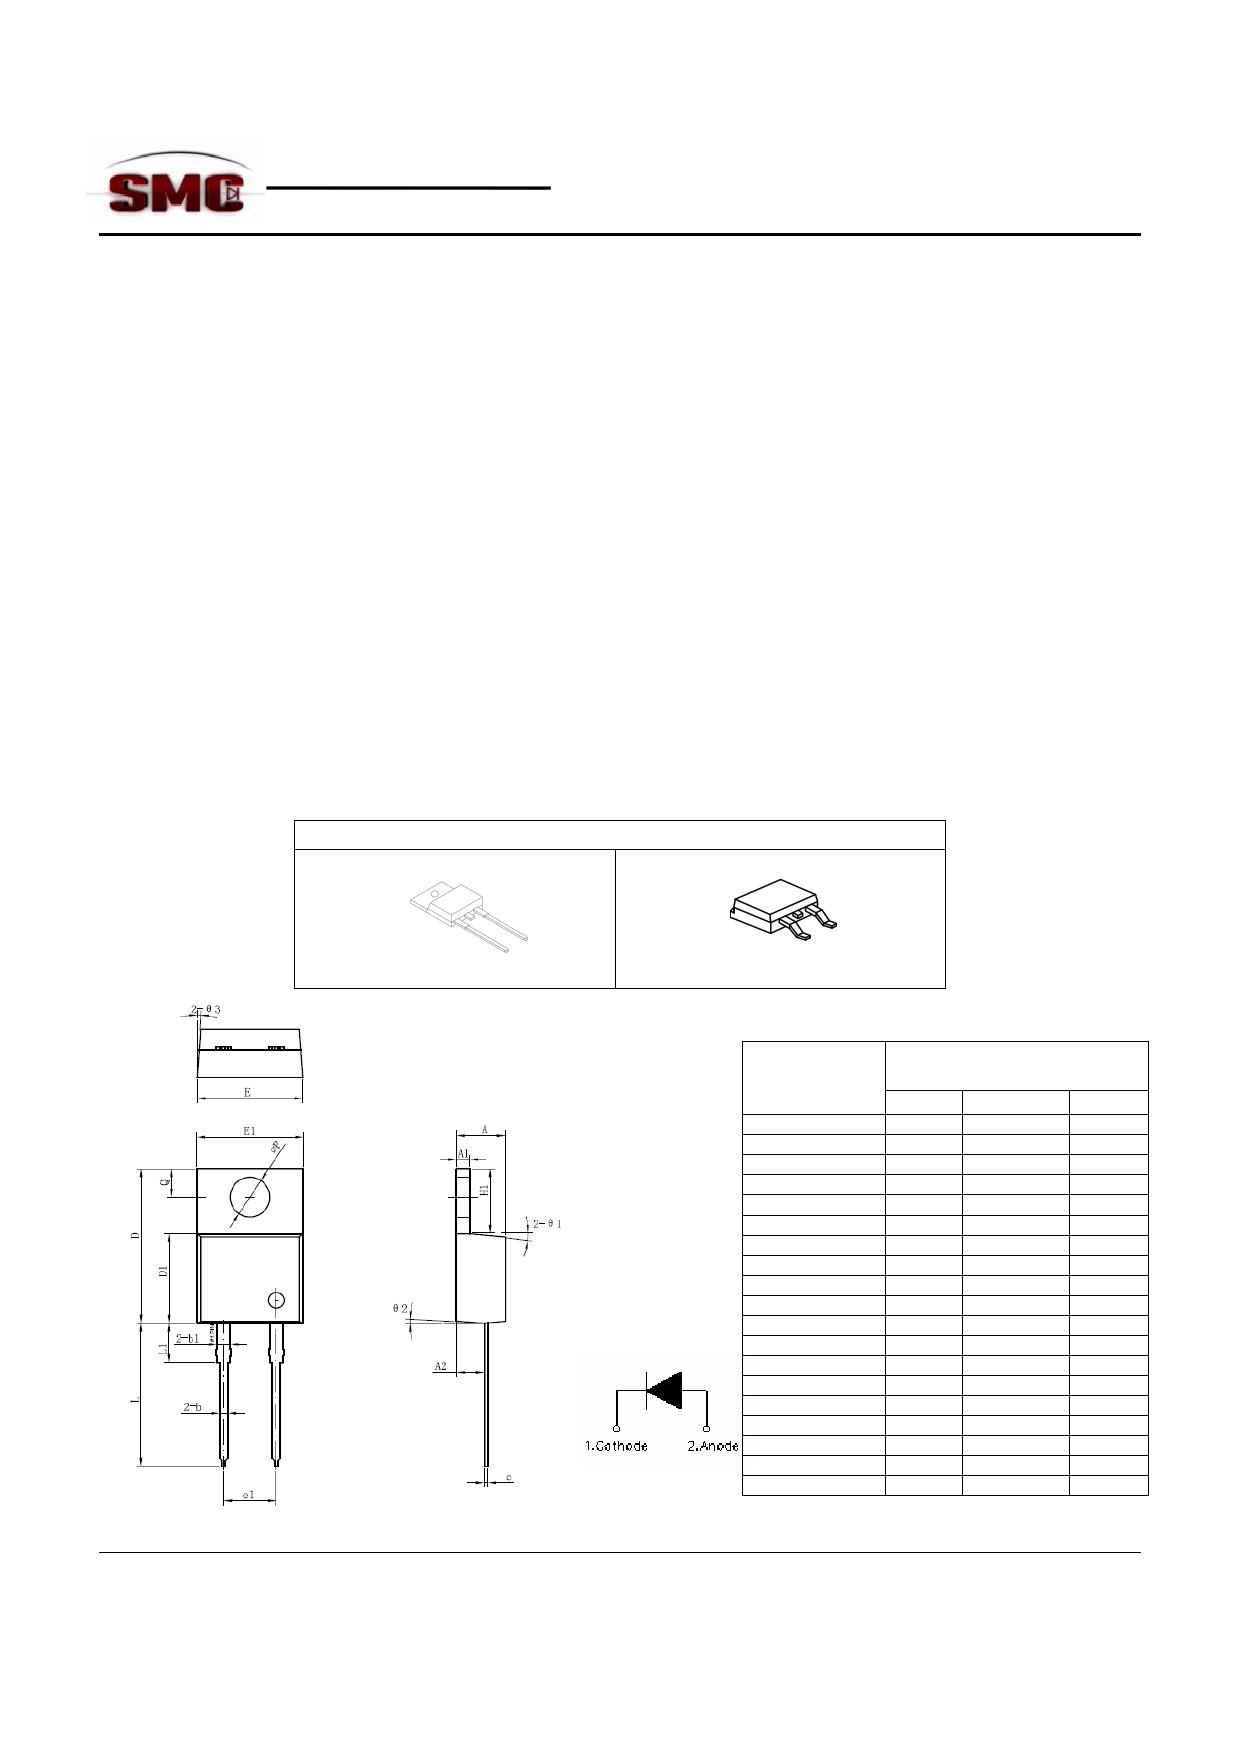 10TQ045S Datasheet, 10TQ045S PDF,ピン配置, 機能